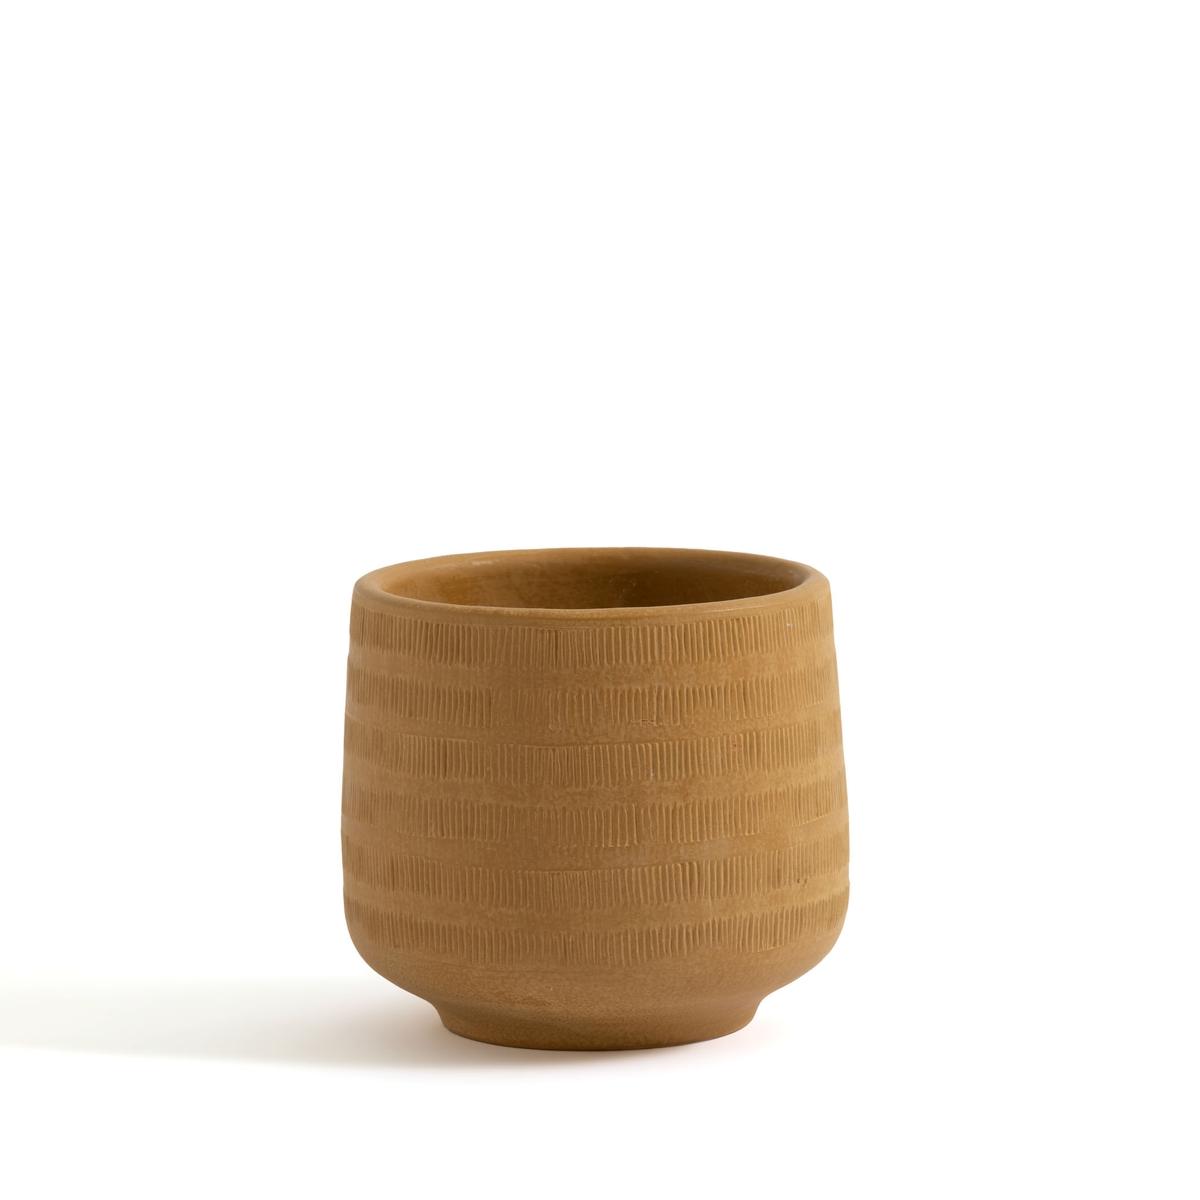 Кашпо La Redoute Из керамики Kira единый размер желтый кашпо la redoute из керамики в см euphyllia единый размер синий